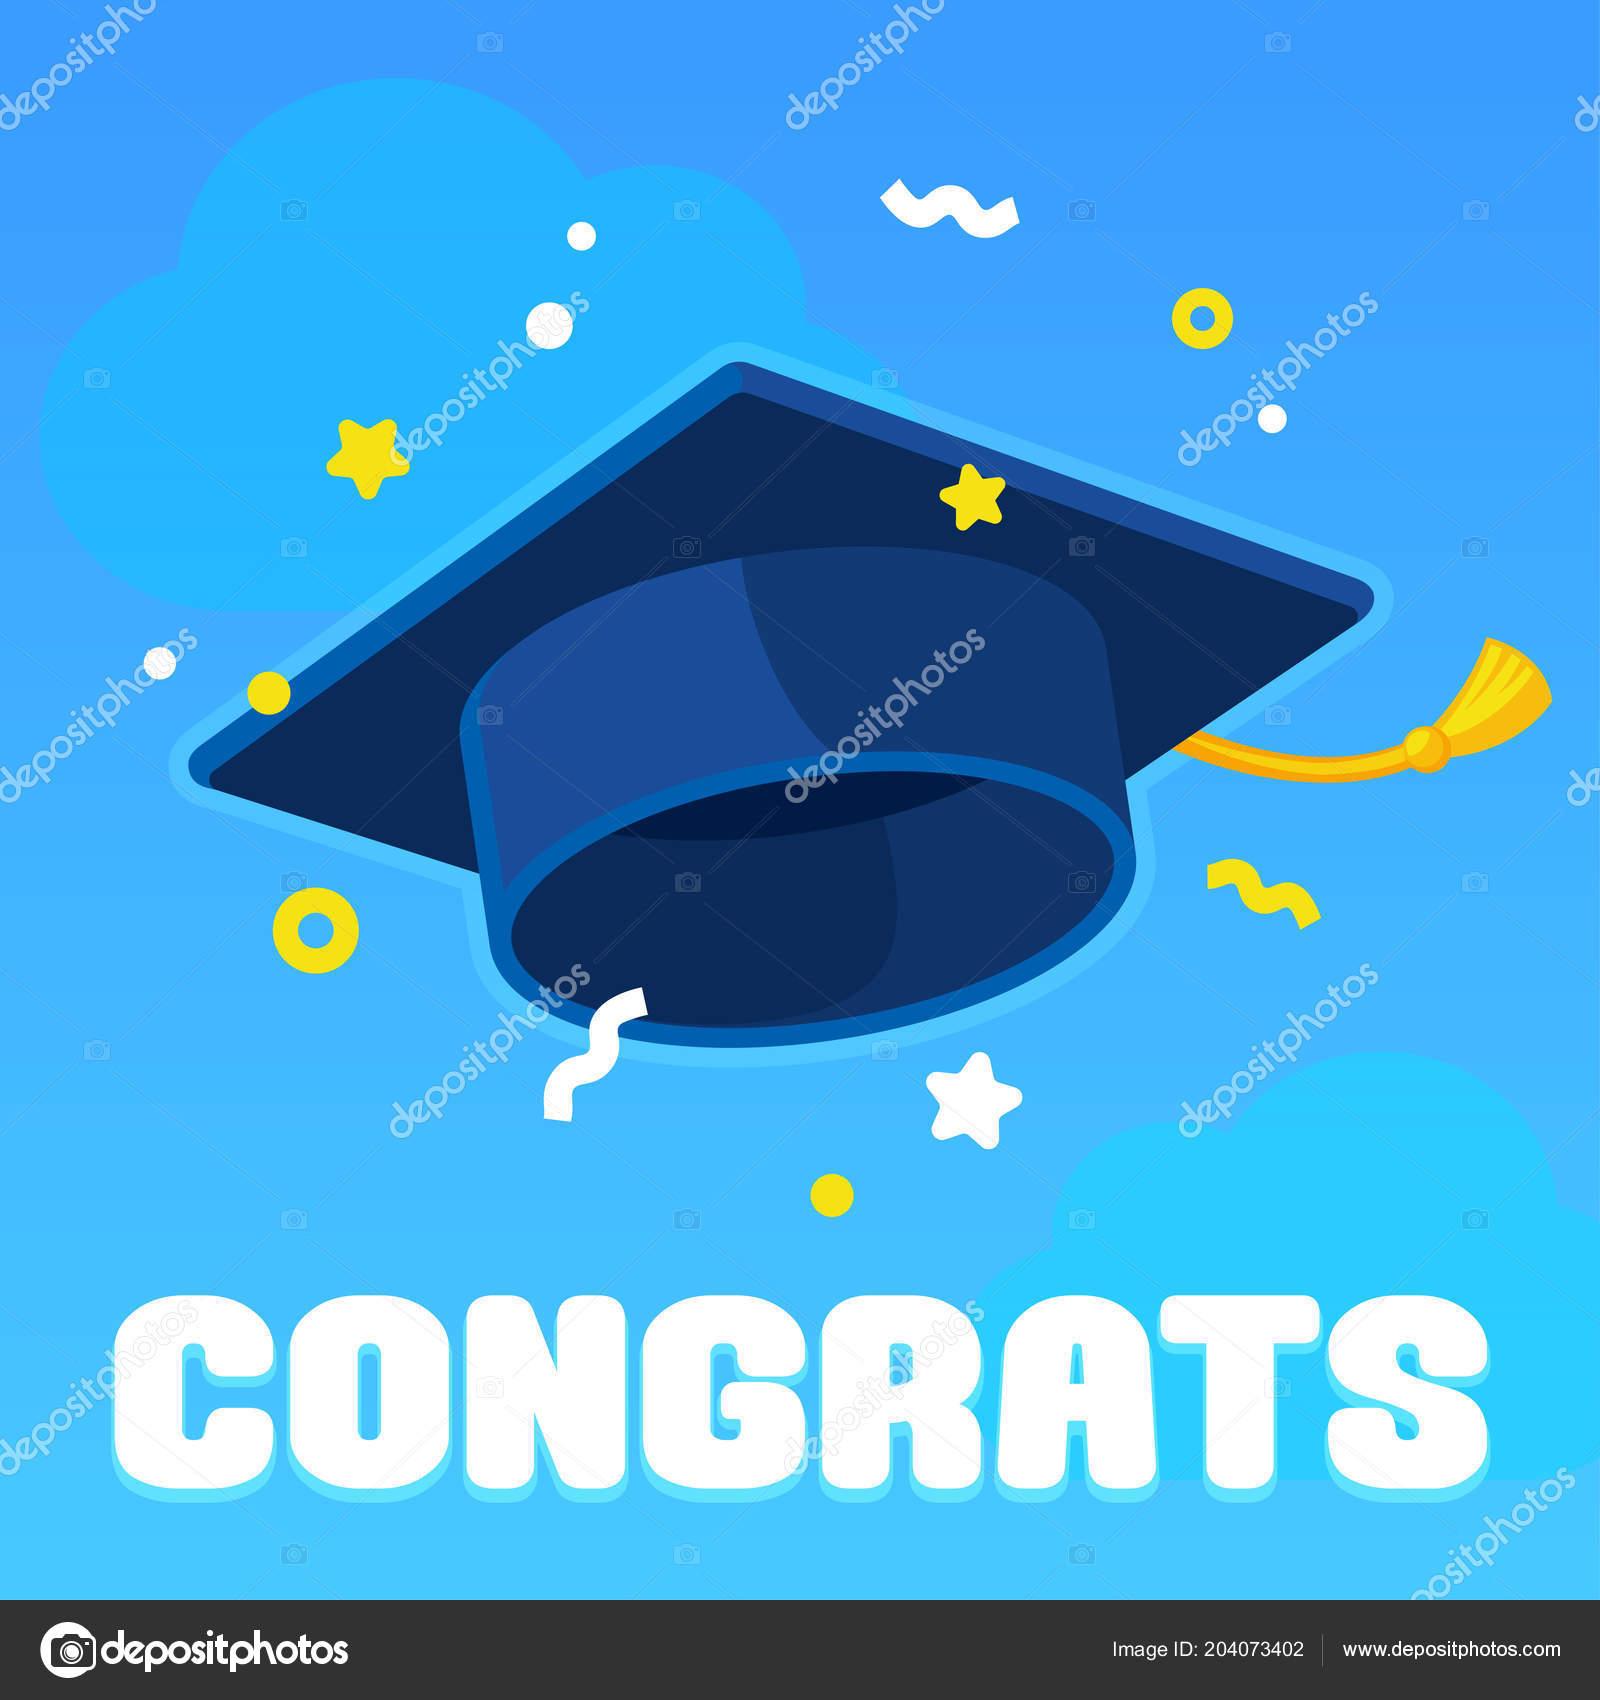 graduate hat tossed sky confetti graduation celebration banner text